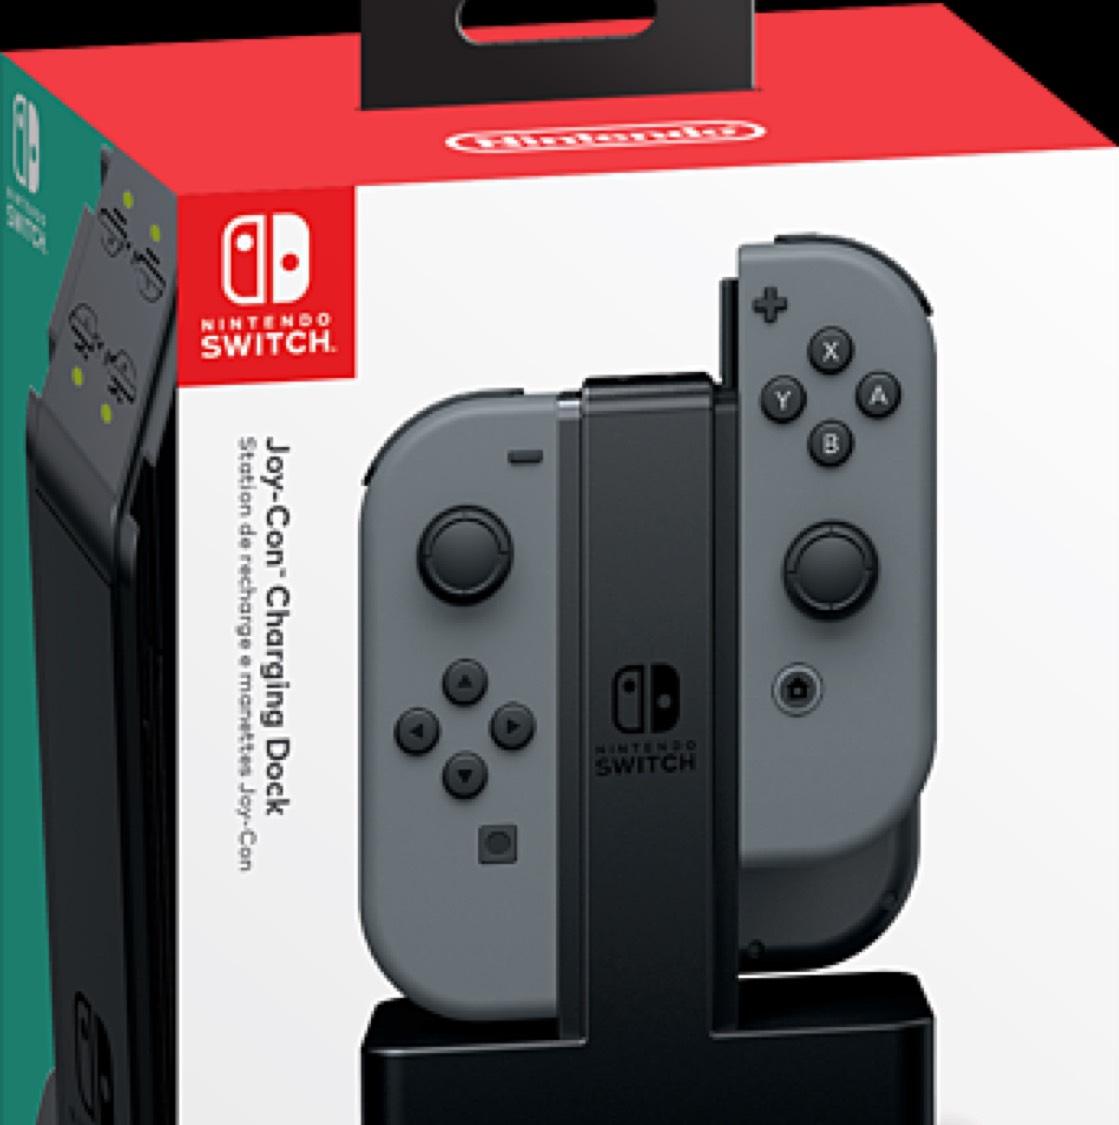 Nintendo switch joy-con charging dock £14.99 @ Tesco